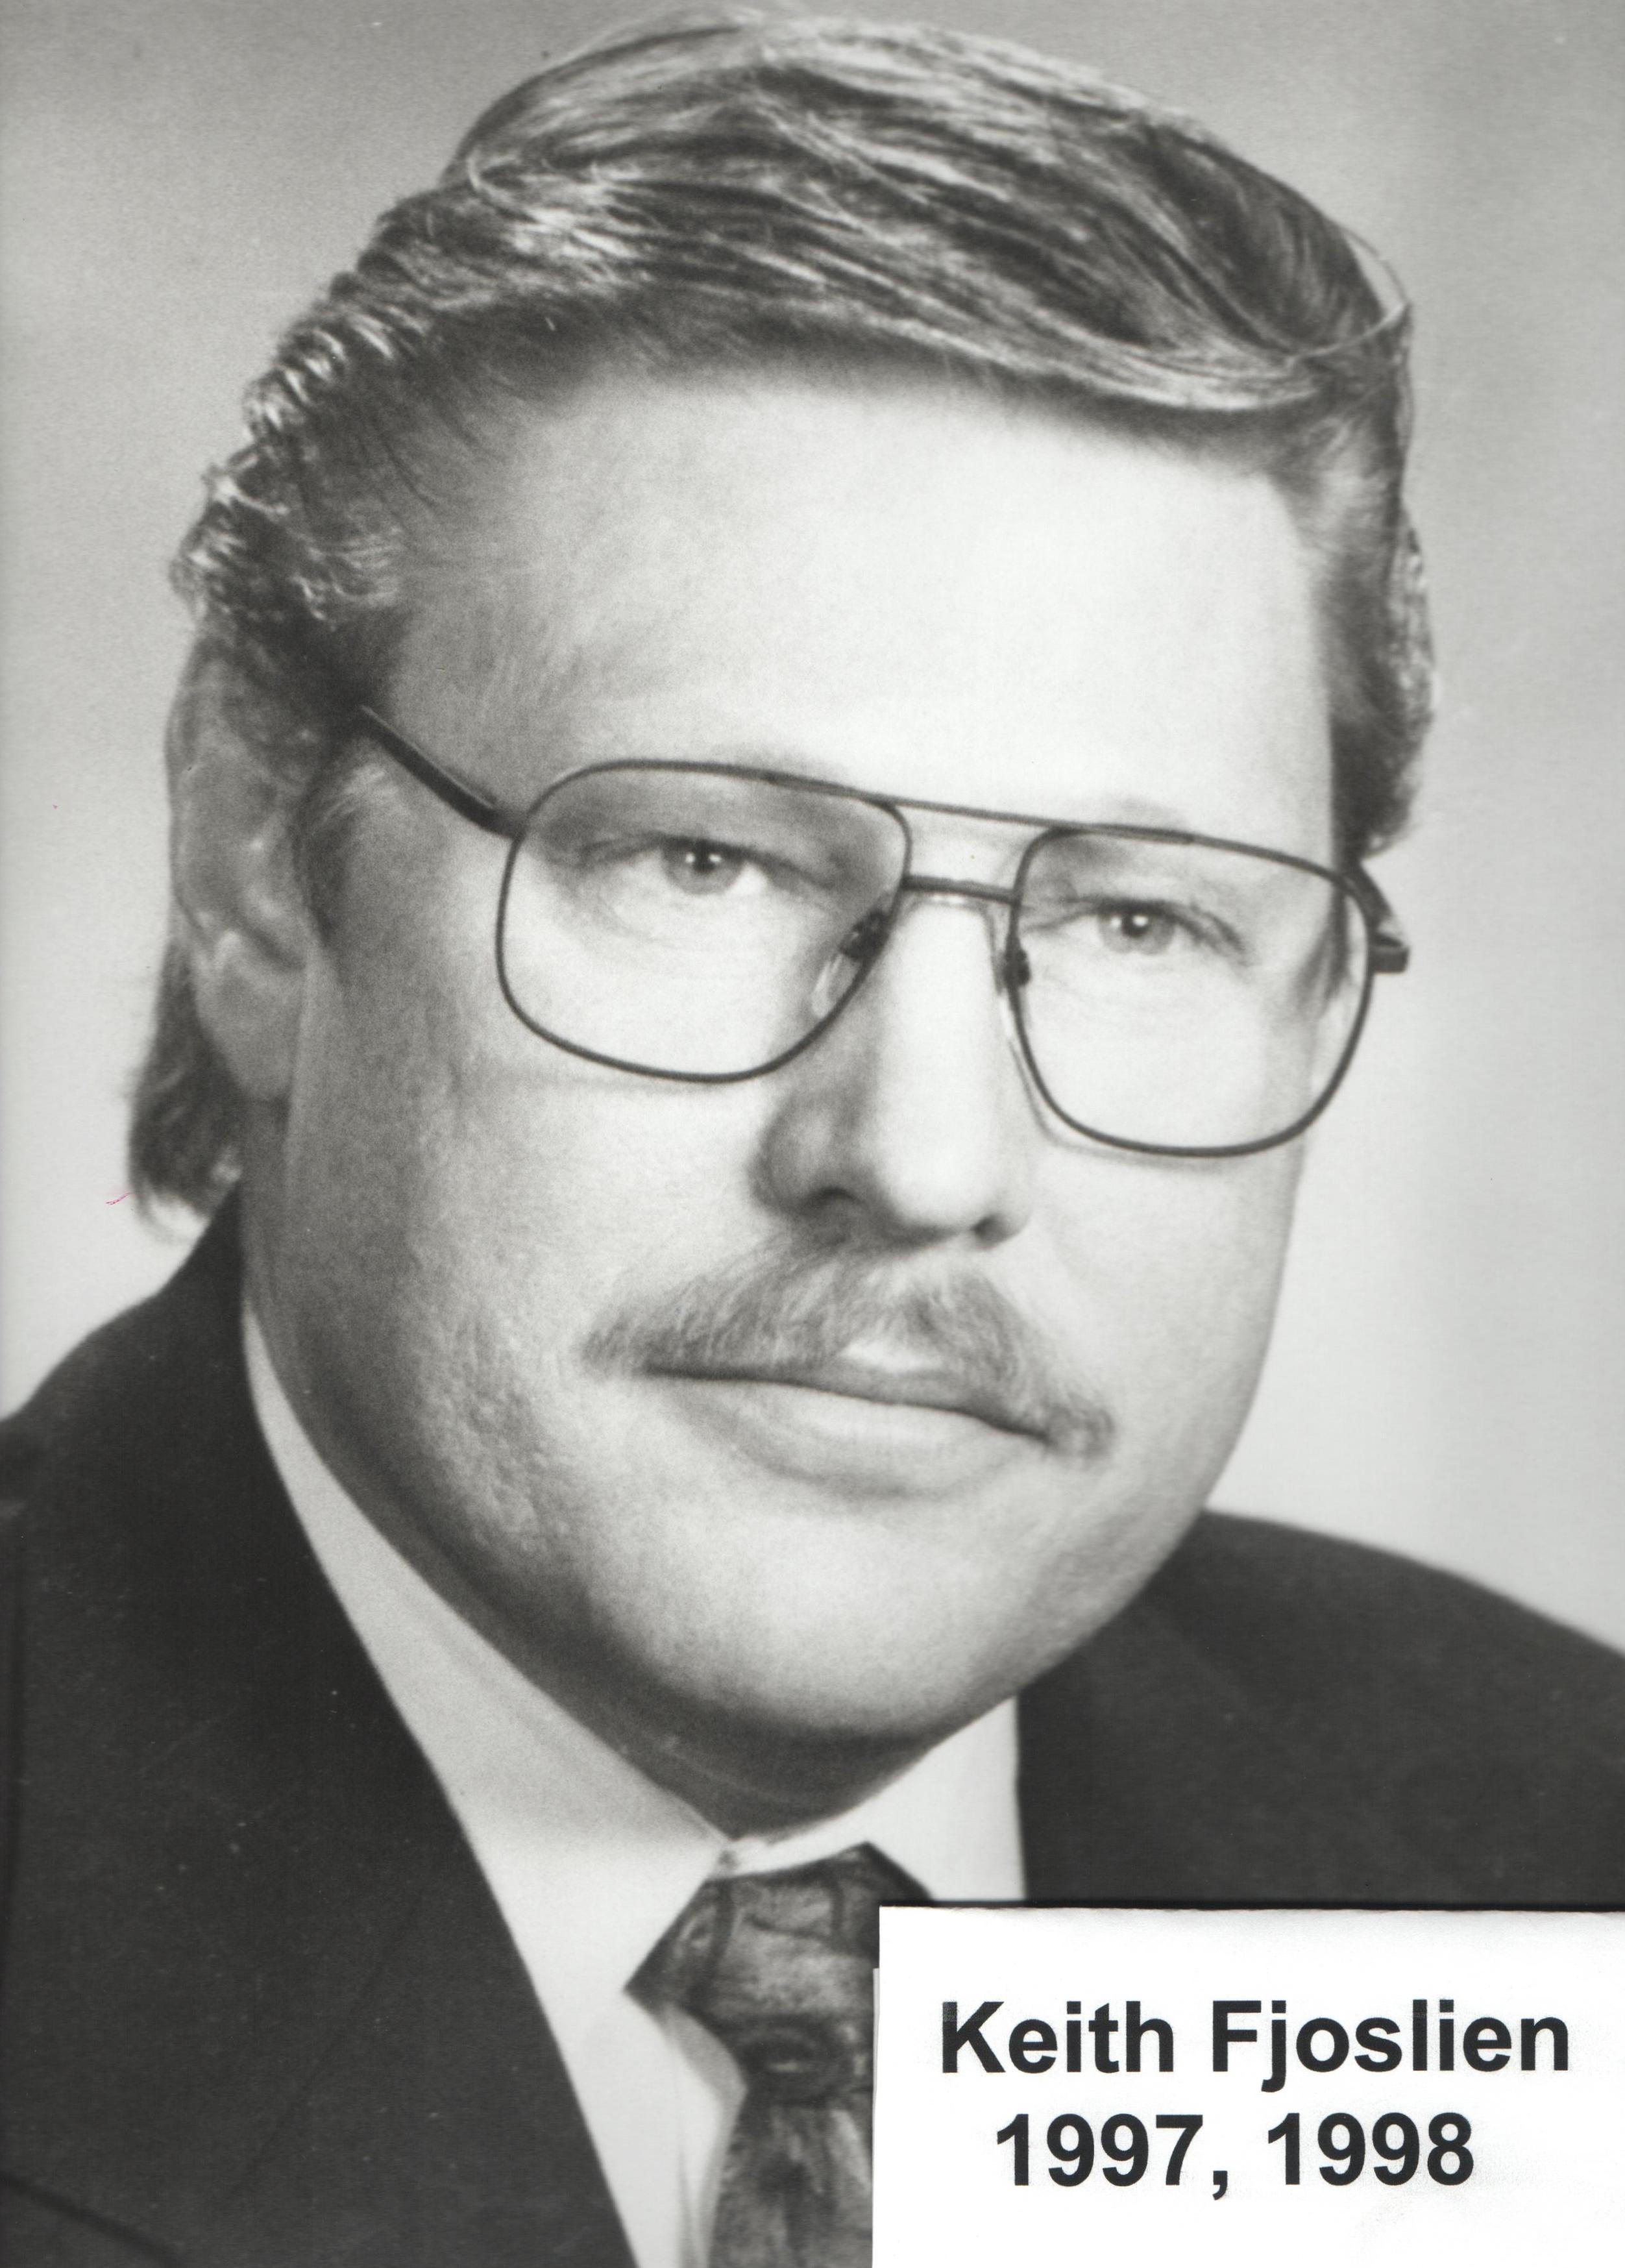 1997-1998 Keith Fjoslien